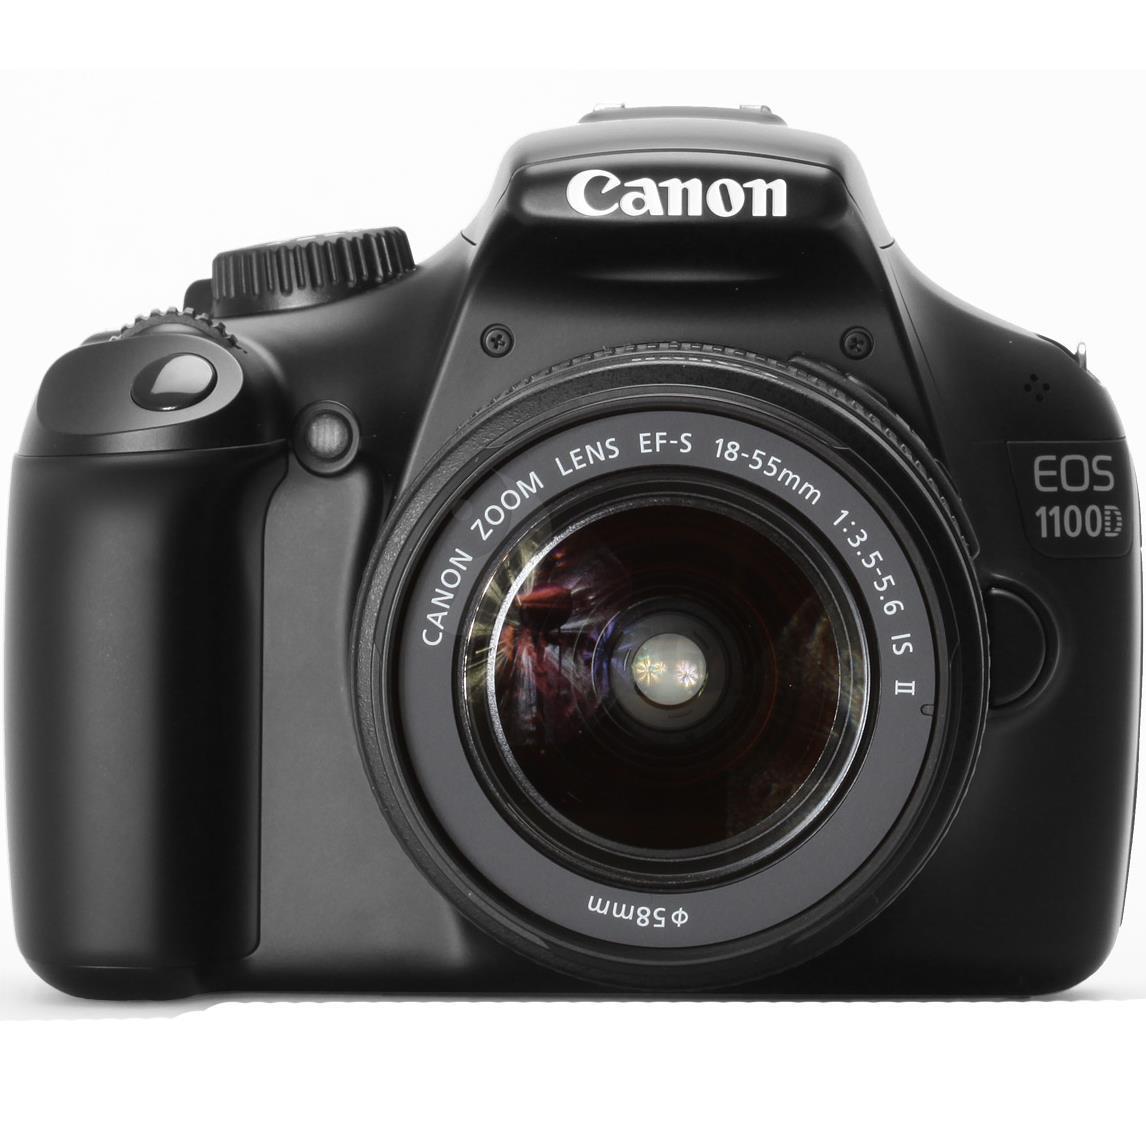 Máy ảnh Canon EOS1100 lens 18-55mm màu xám